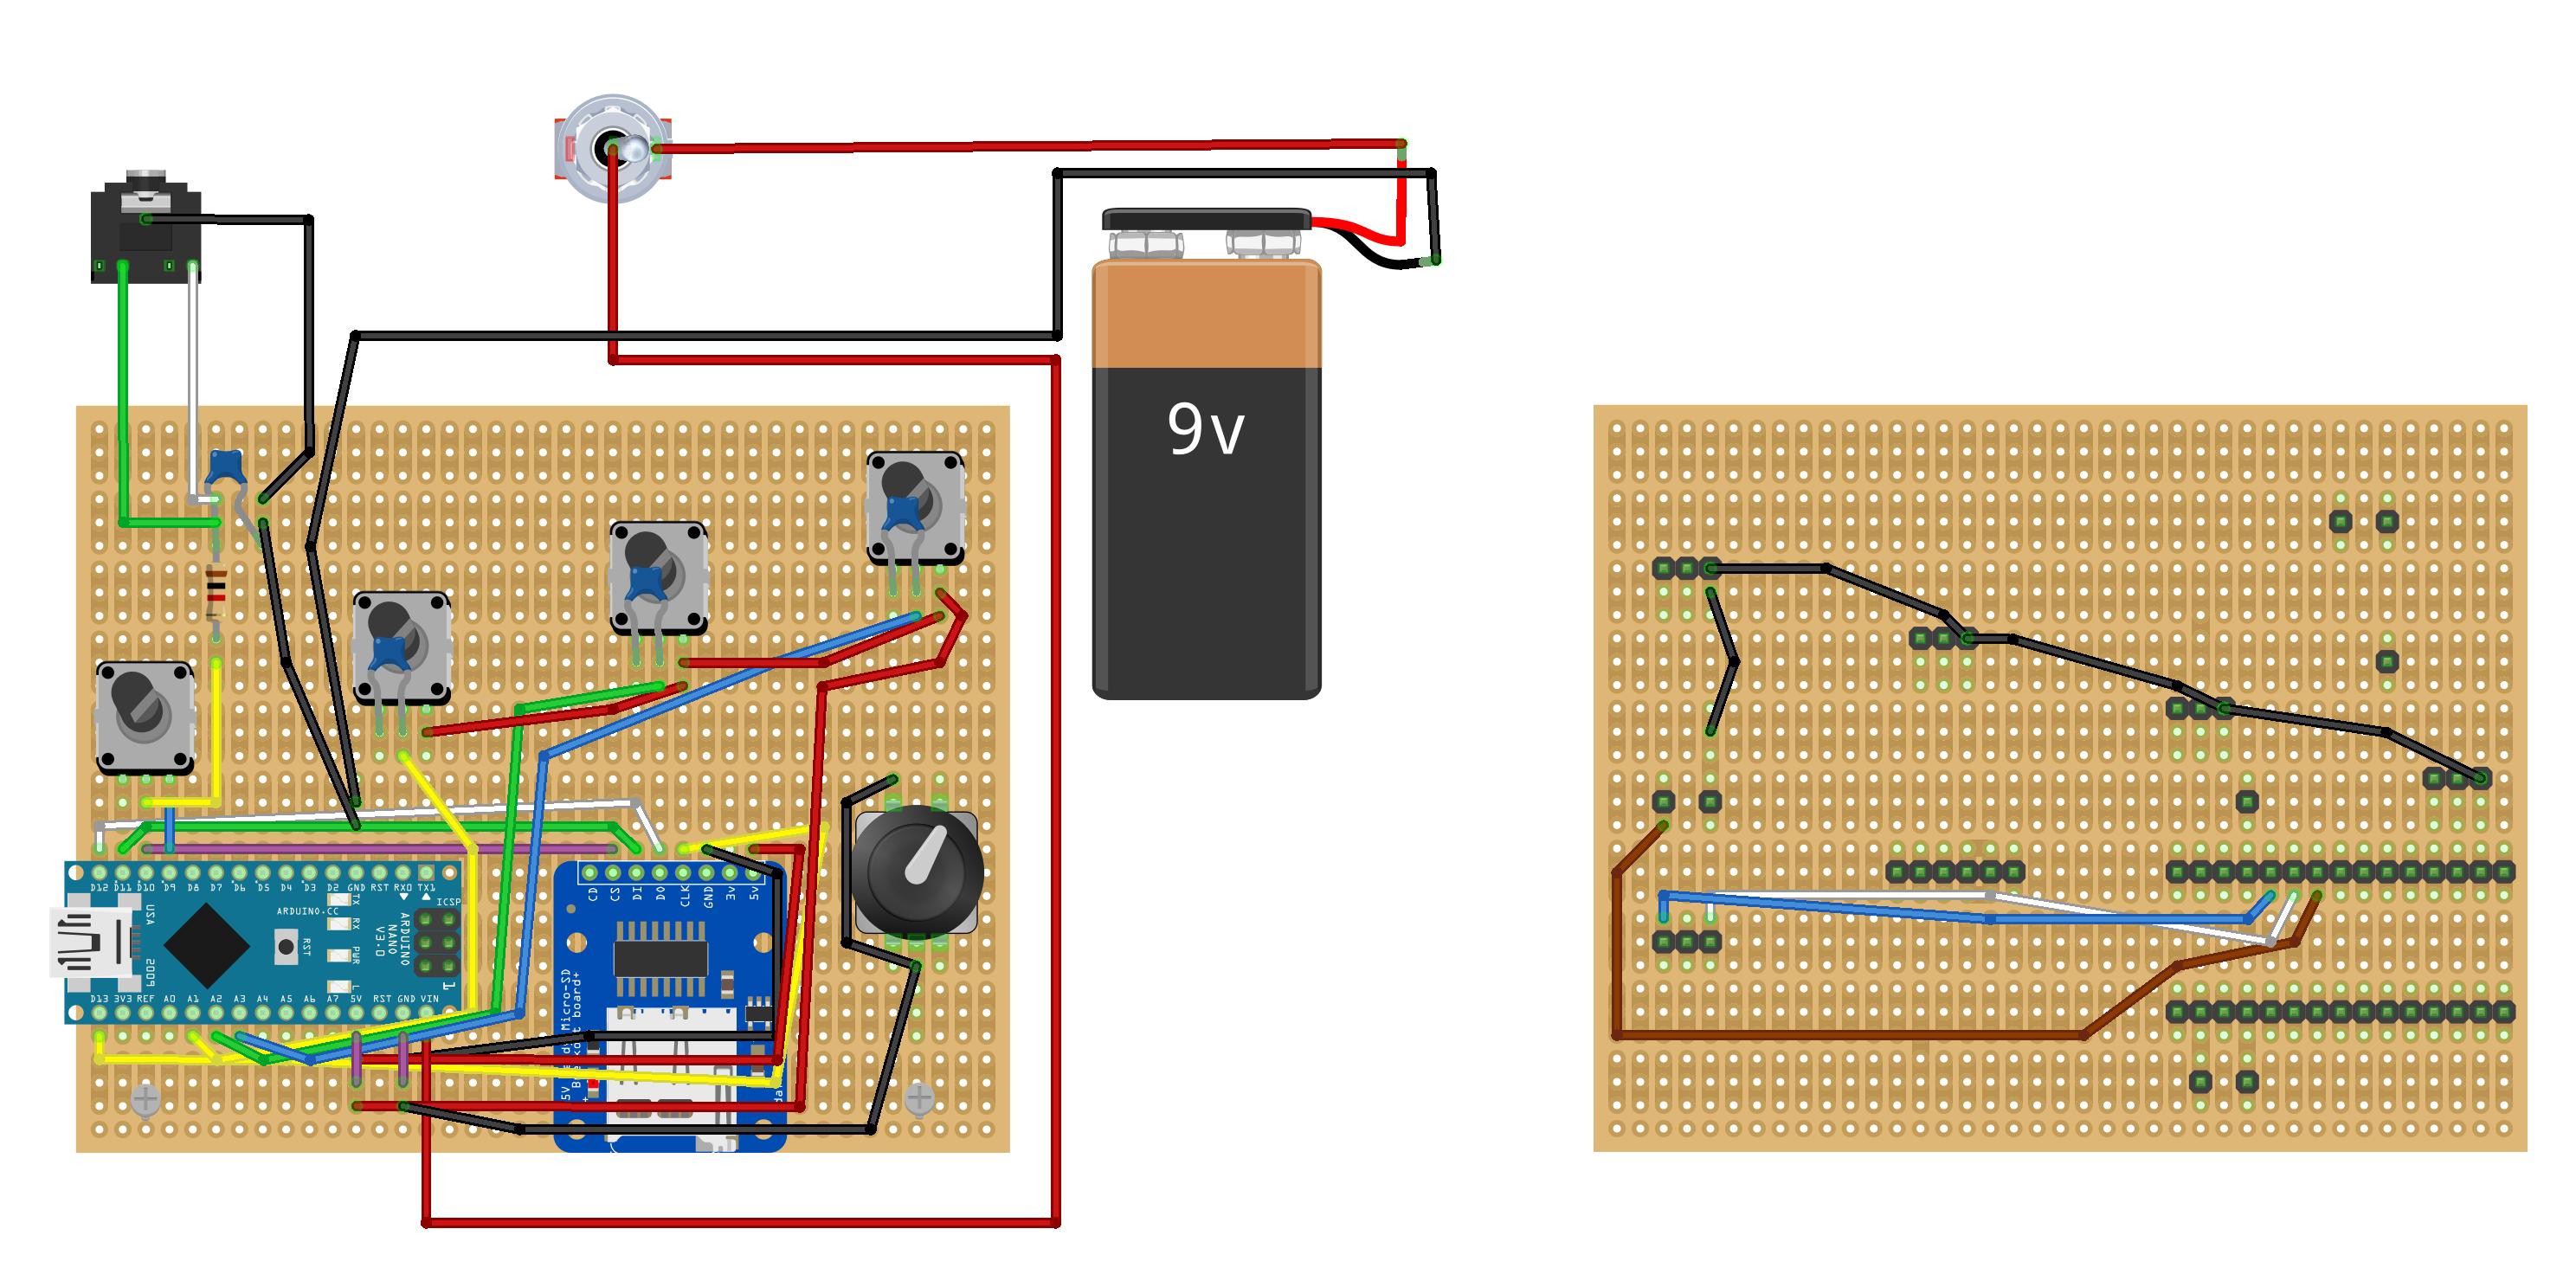 Assemble tdprojekt prototyp3 290517 ap2vsgjbld